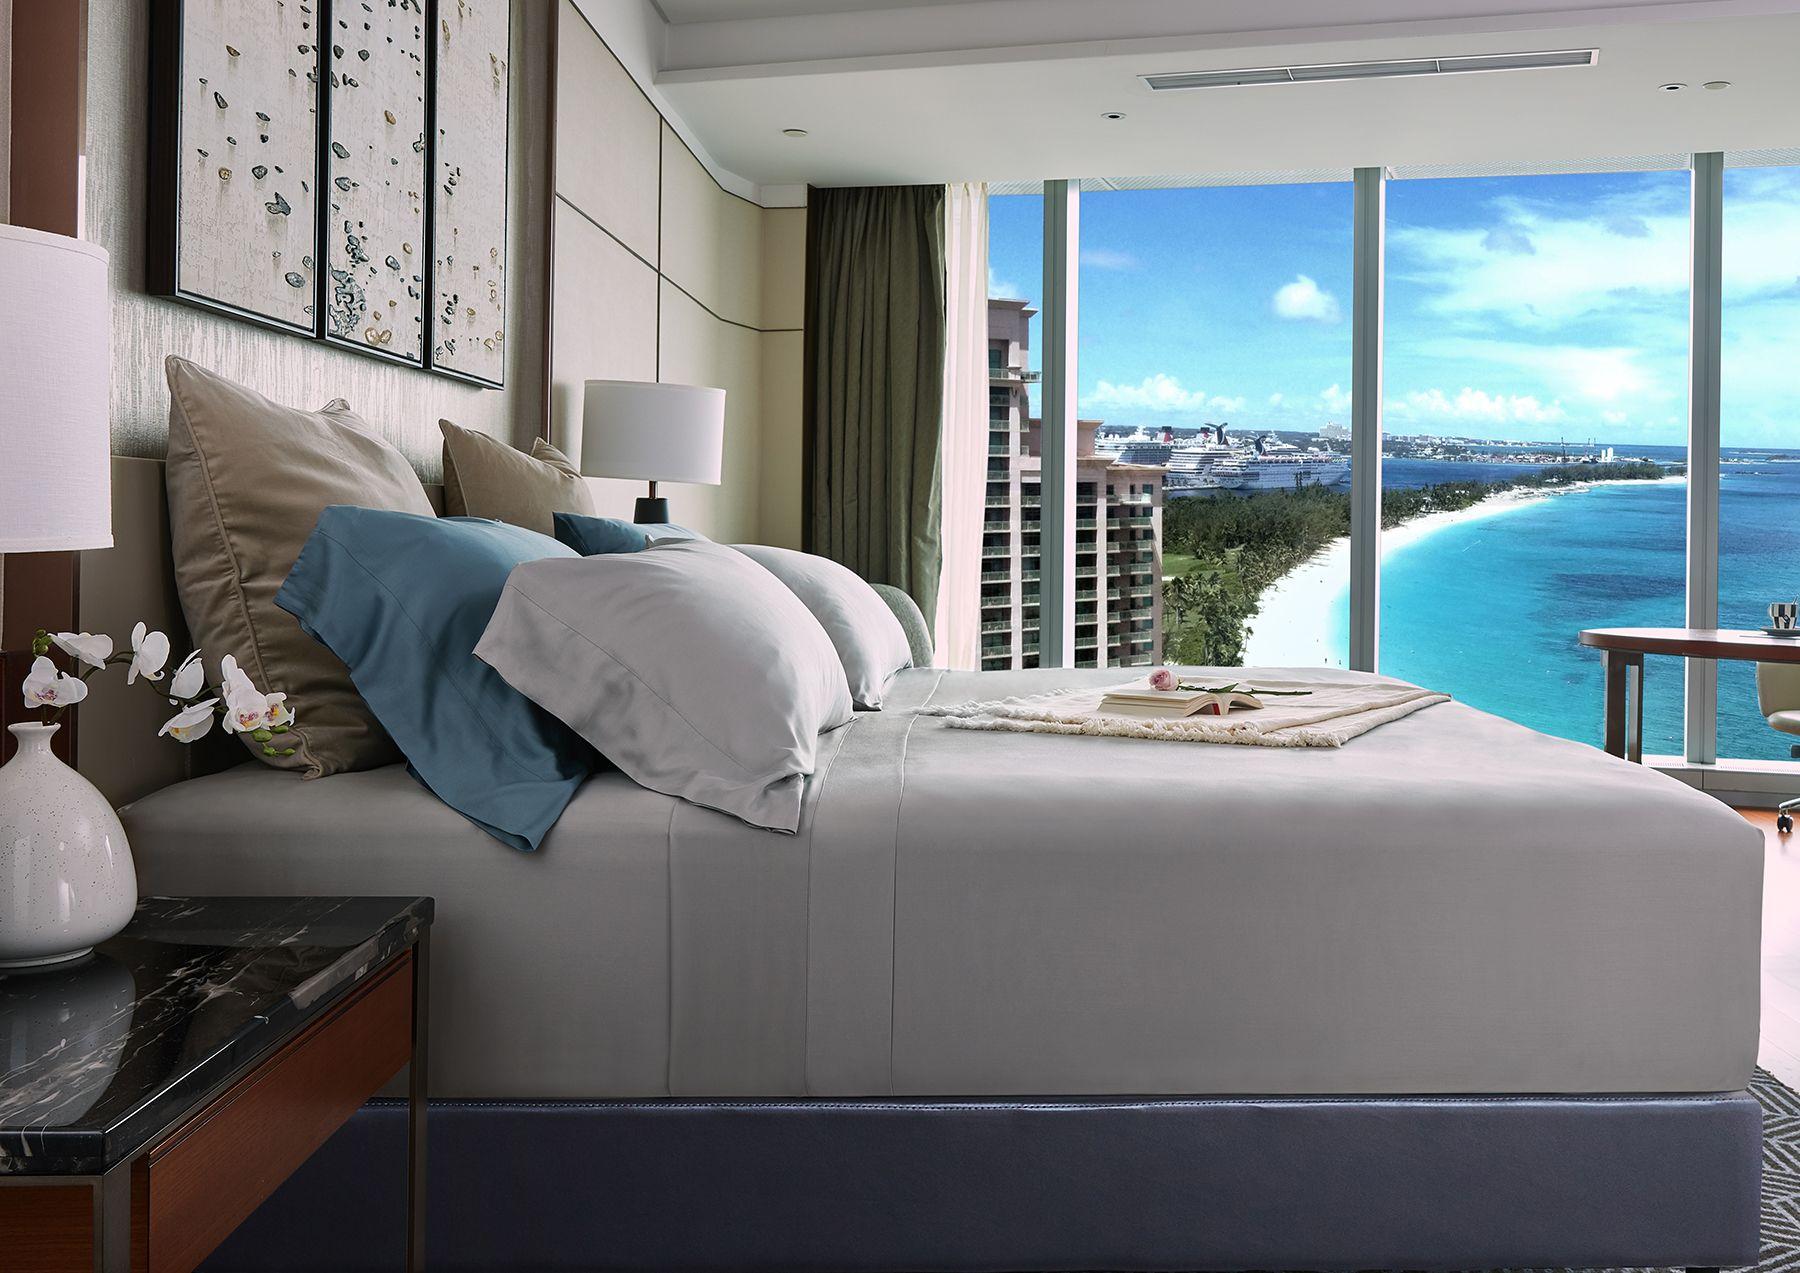 Gokotta Bamboo Sheets 4 Piece Bed Sheet Set 100 Rayon From